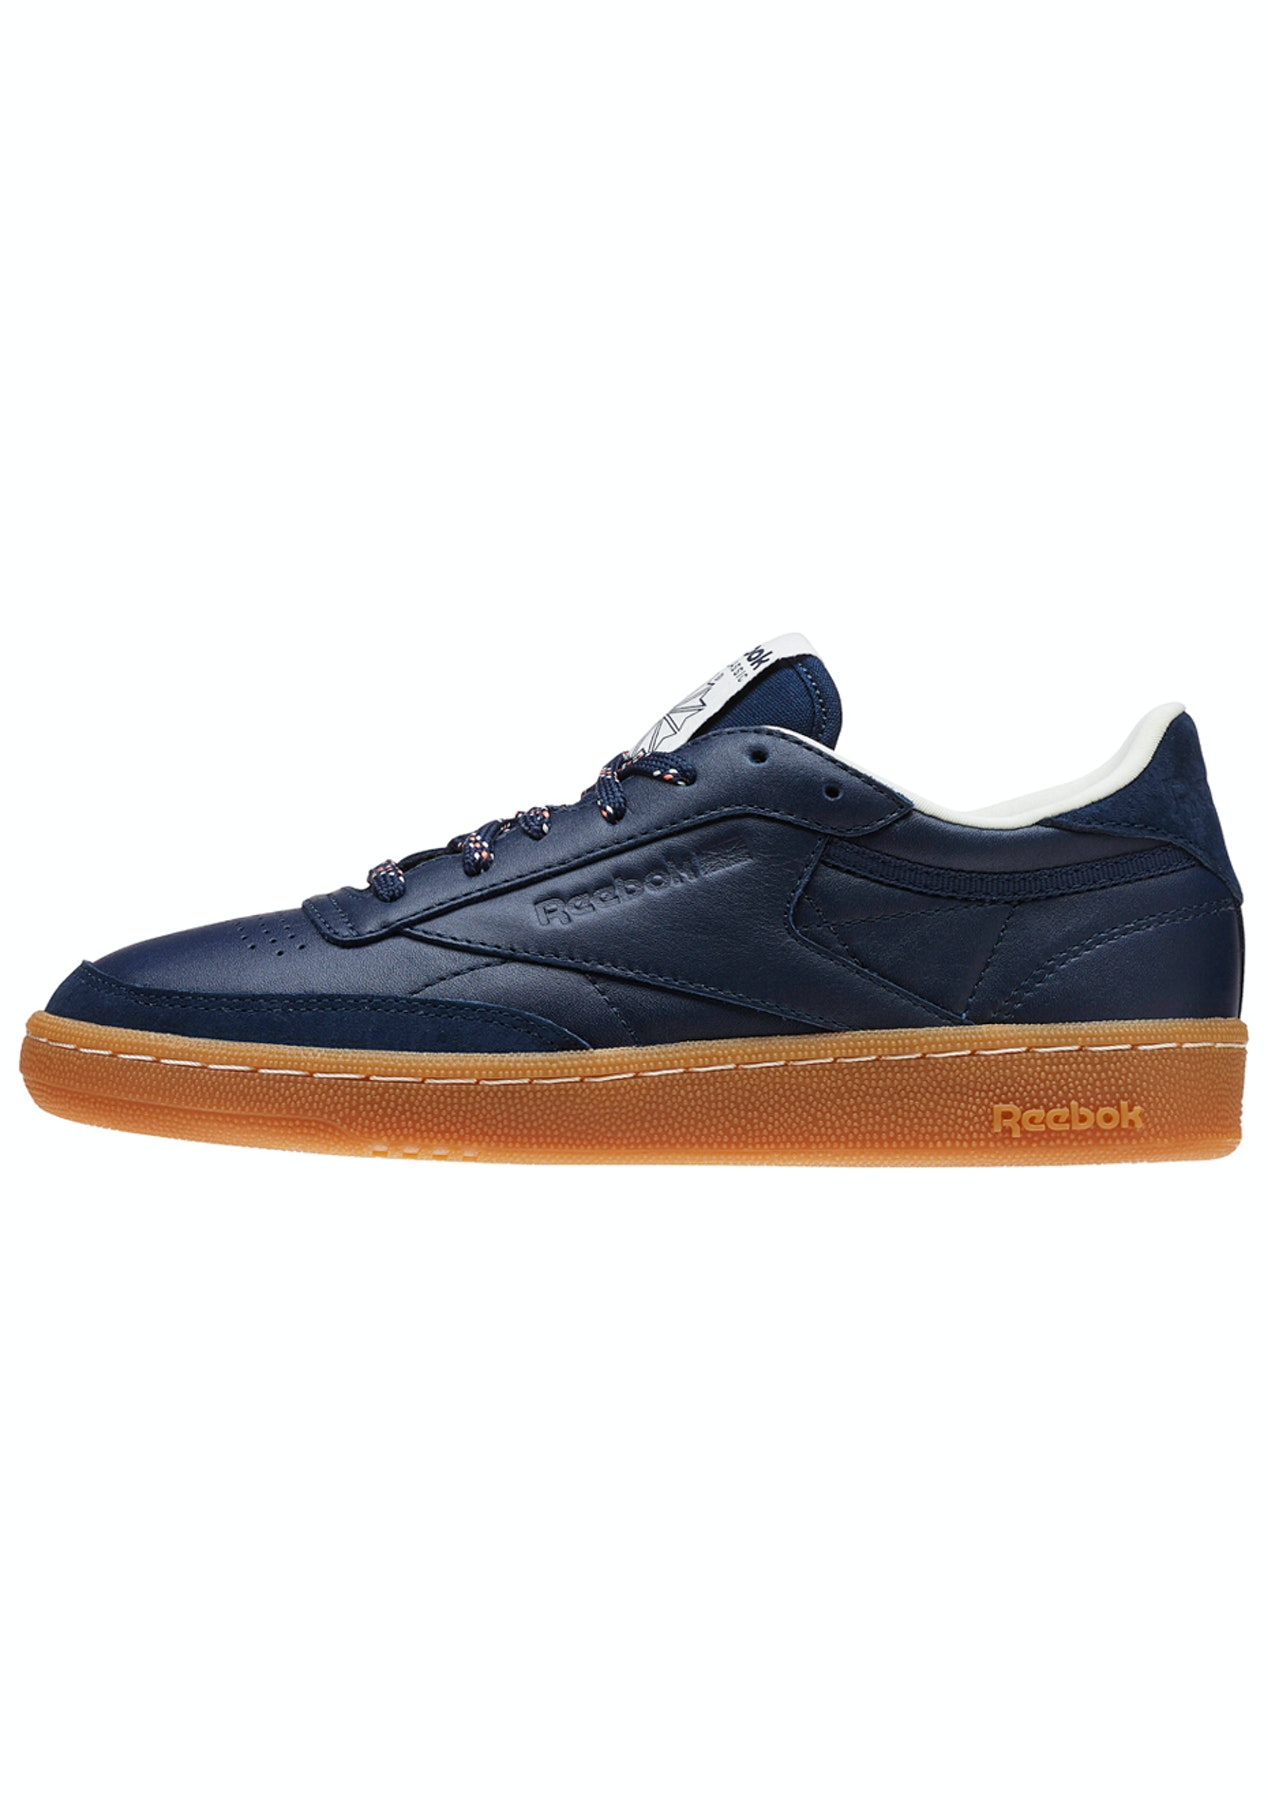 a0535eab1cede Reebok Womens - Club C 85 Shades Navy Classic White - Free Shipping Shoe  Sale - Onceit